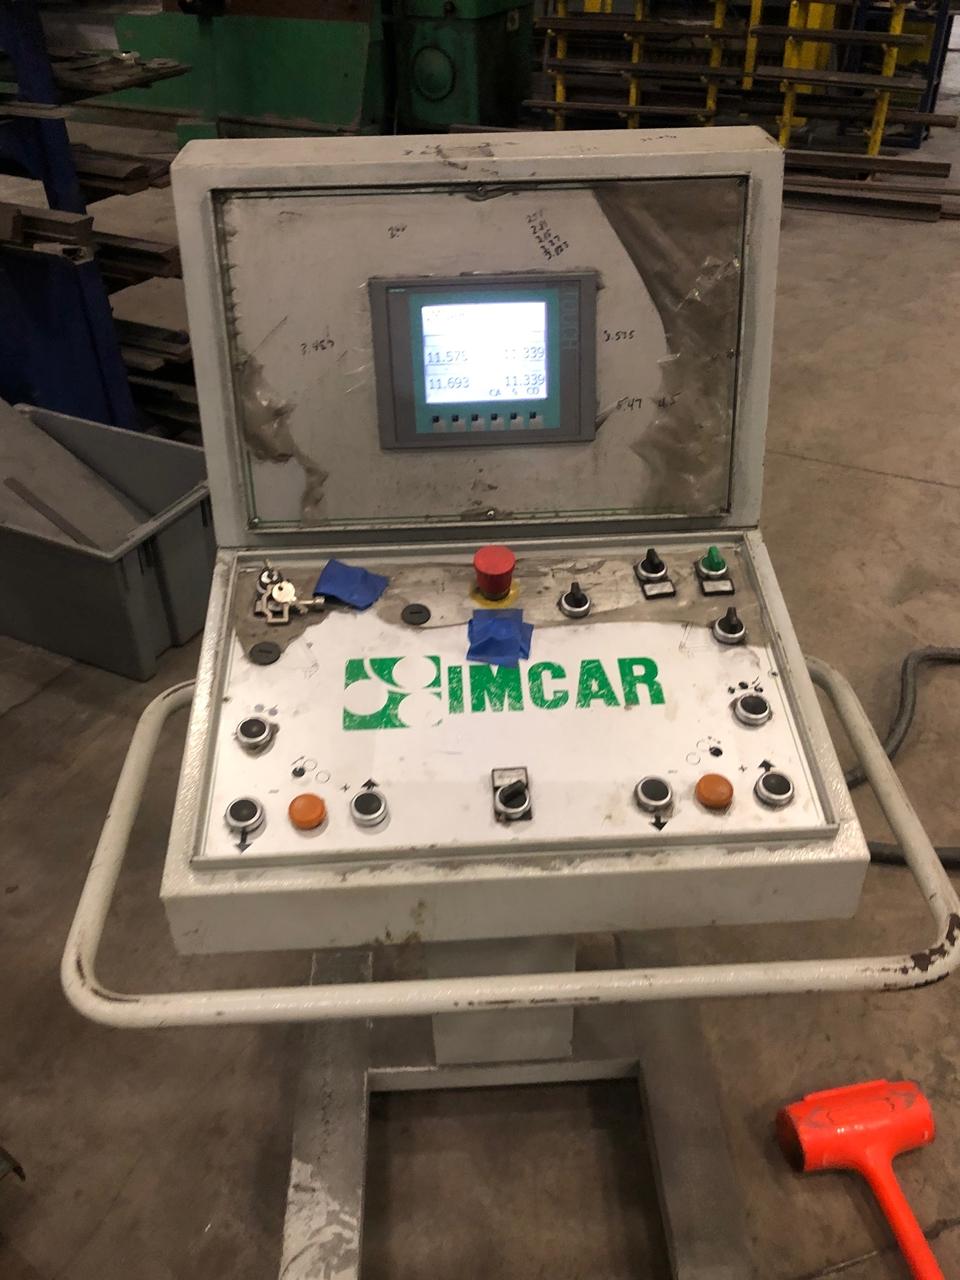 "13' x 3/4"" Imcar Double Initial Pinch Hydraulic Plate"